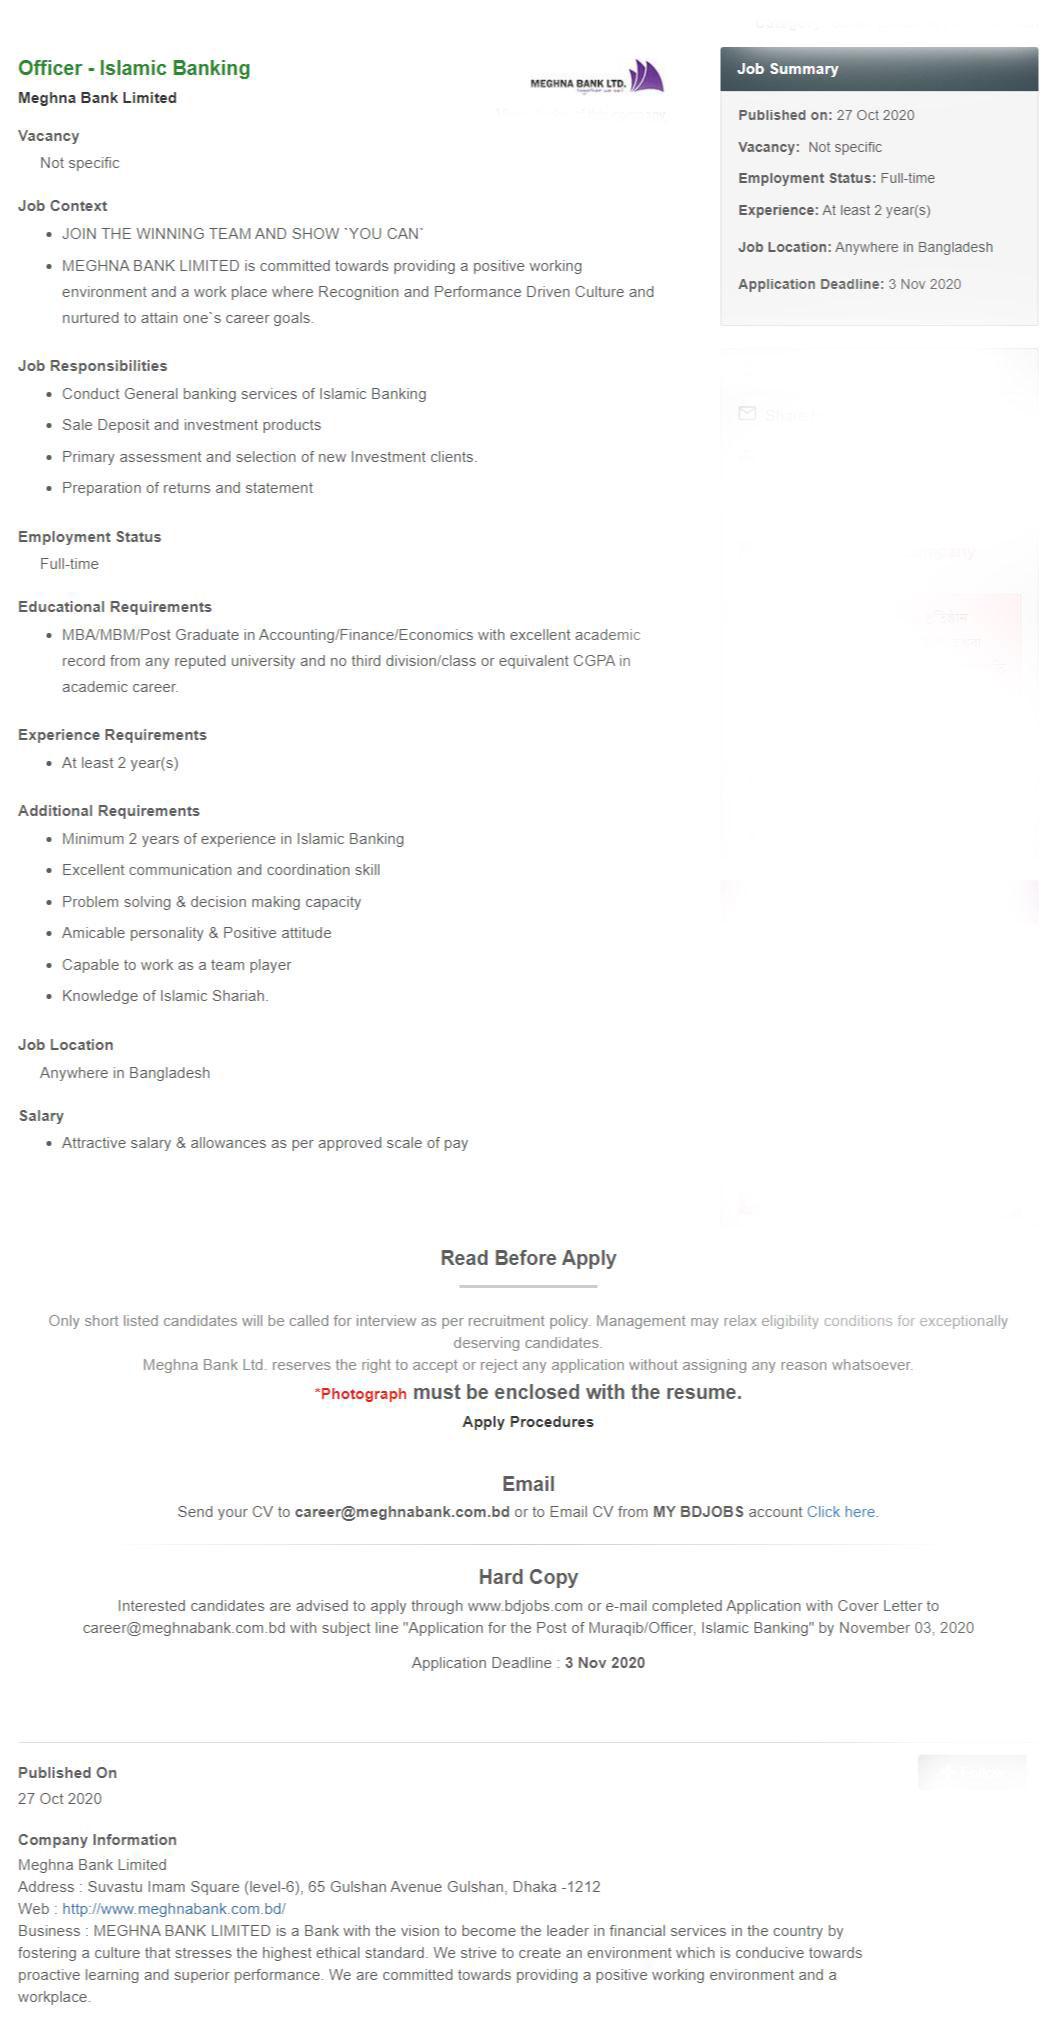 Meghna Bank Job Circular 2021| Private Bank Job Circular www.meghnabank.com.bd 1